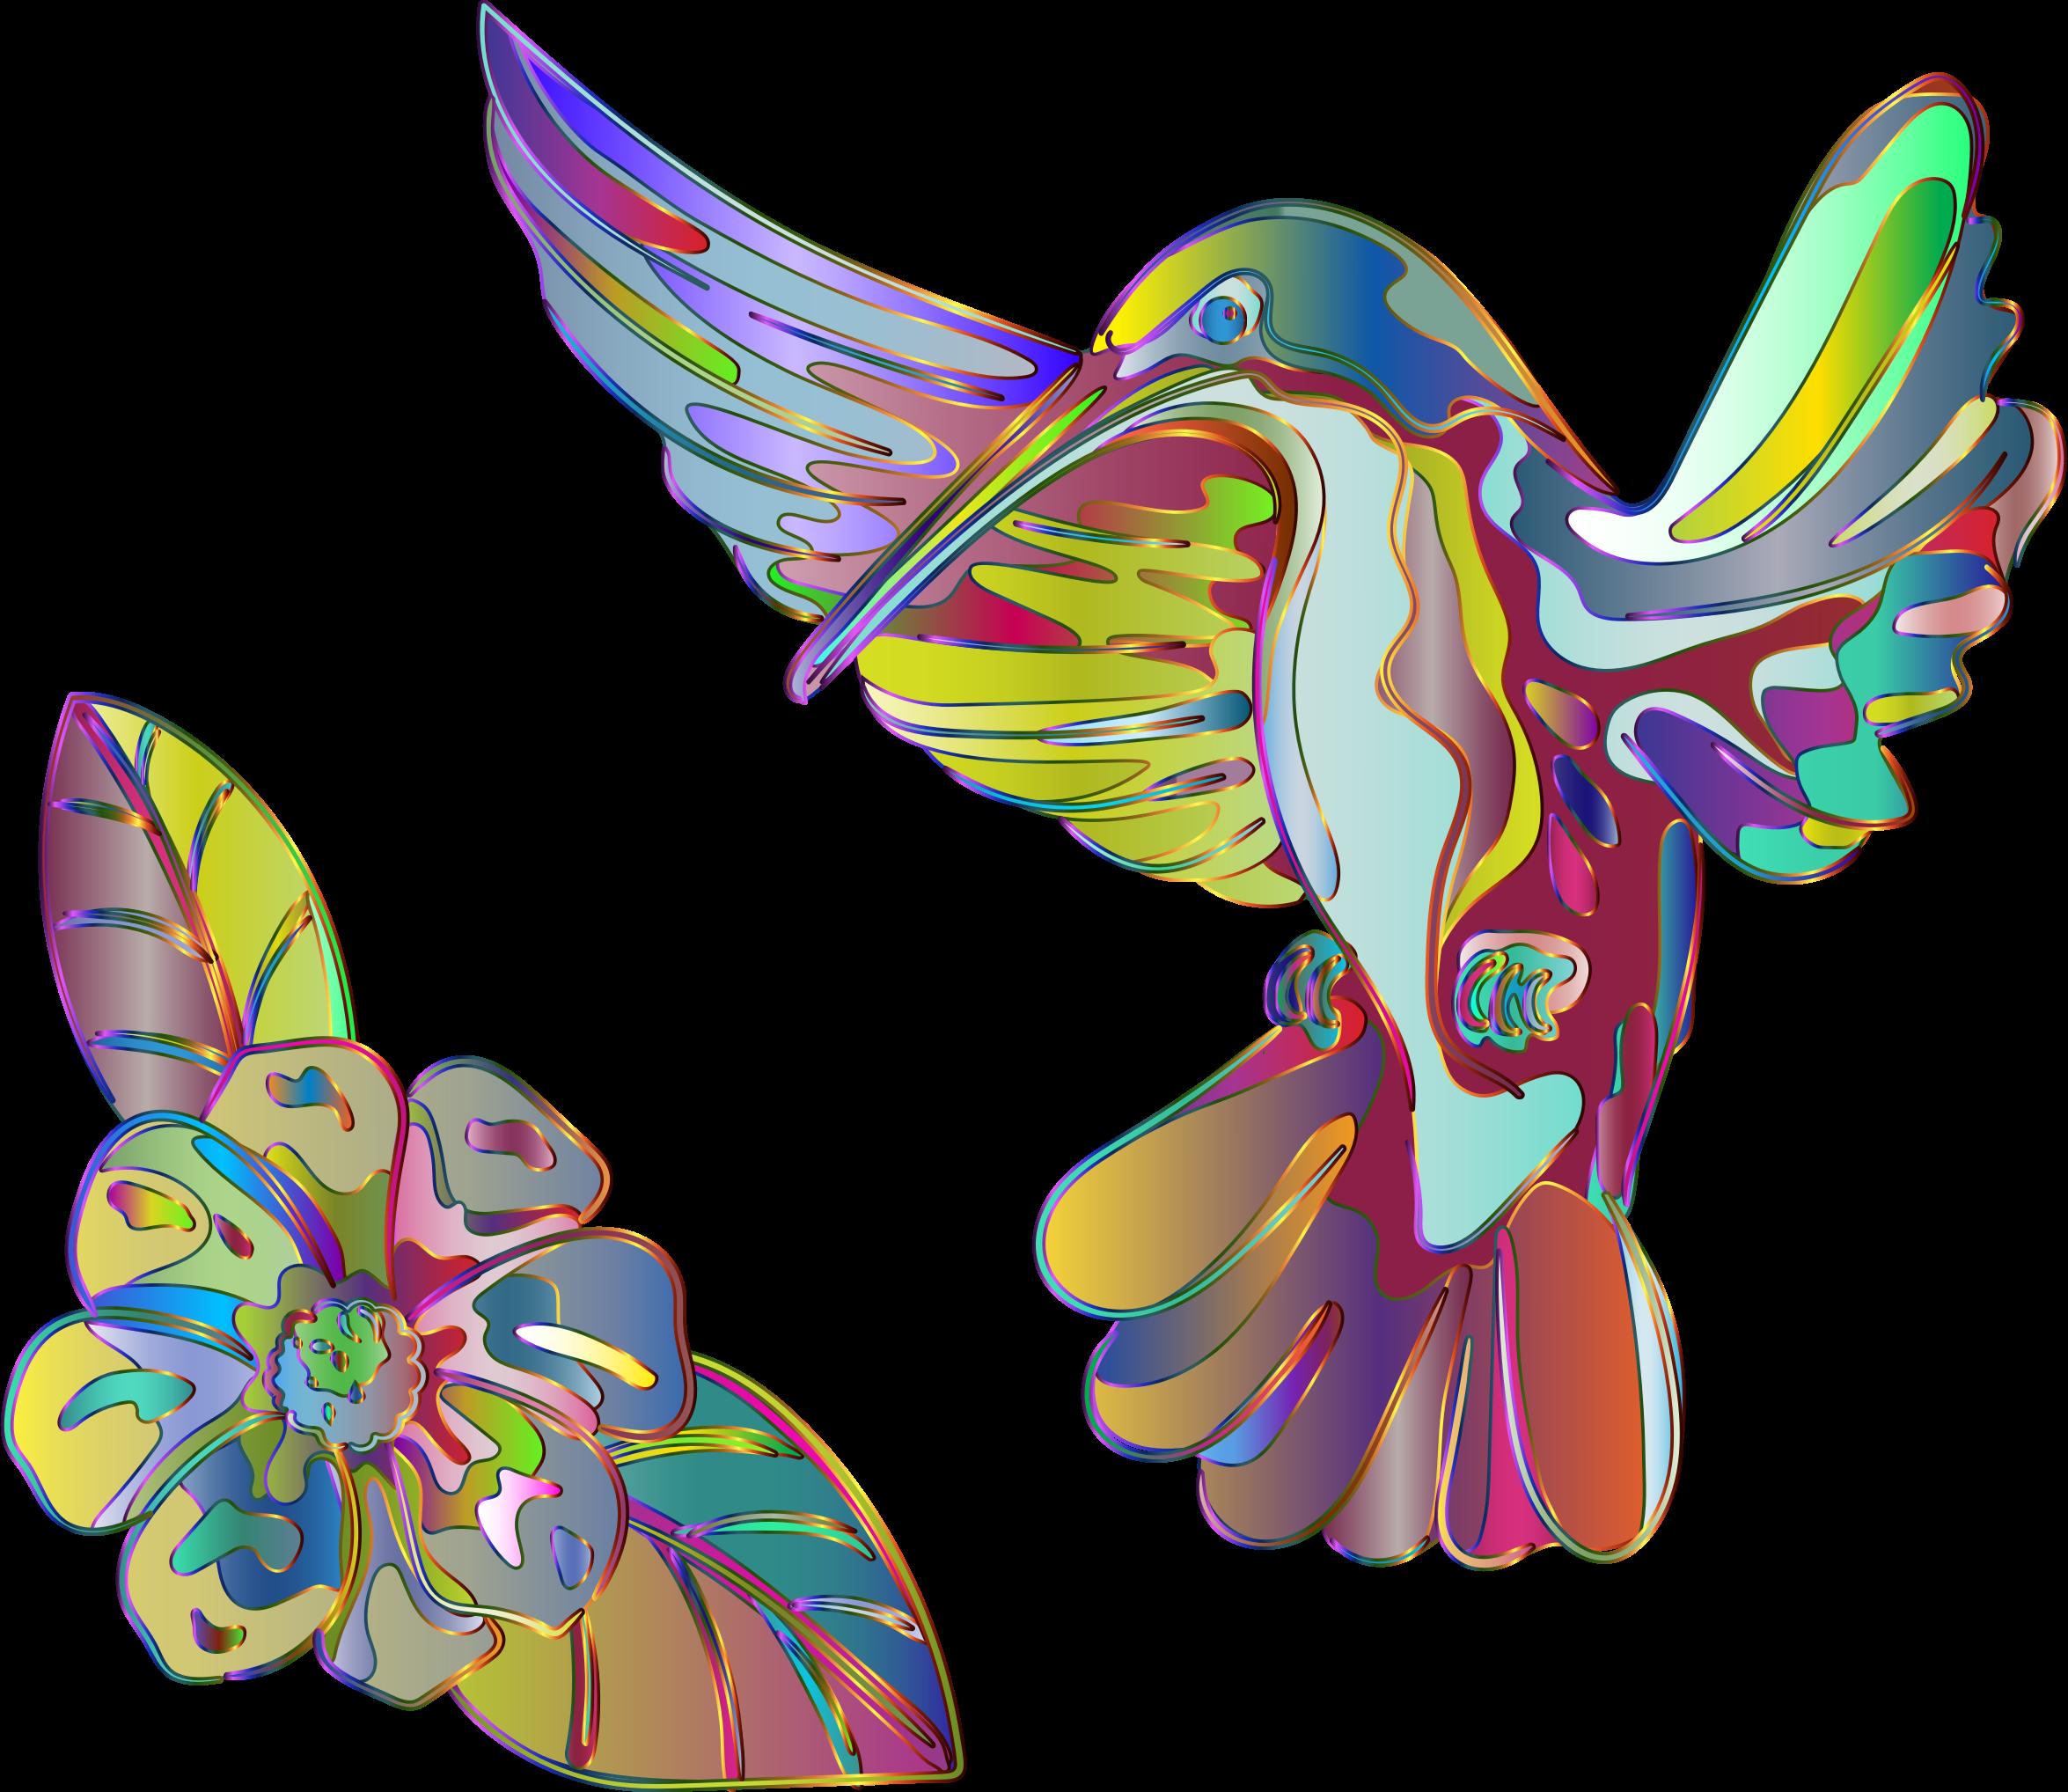 Hummingbird and flower clipart transparent stock Clipart - Abstract Artistic Hummingbird And Flower transparent stock